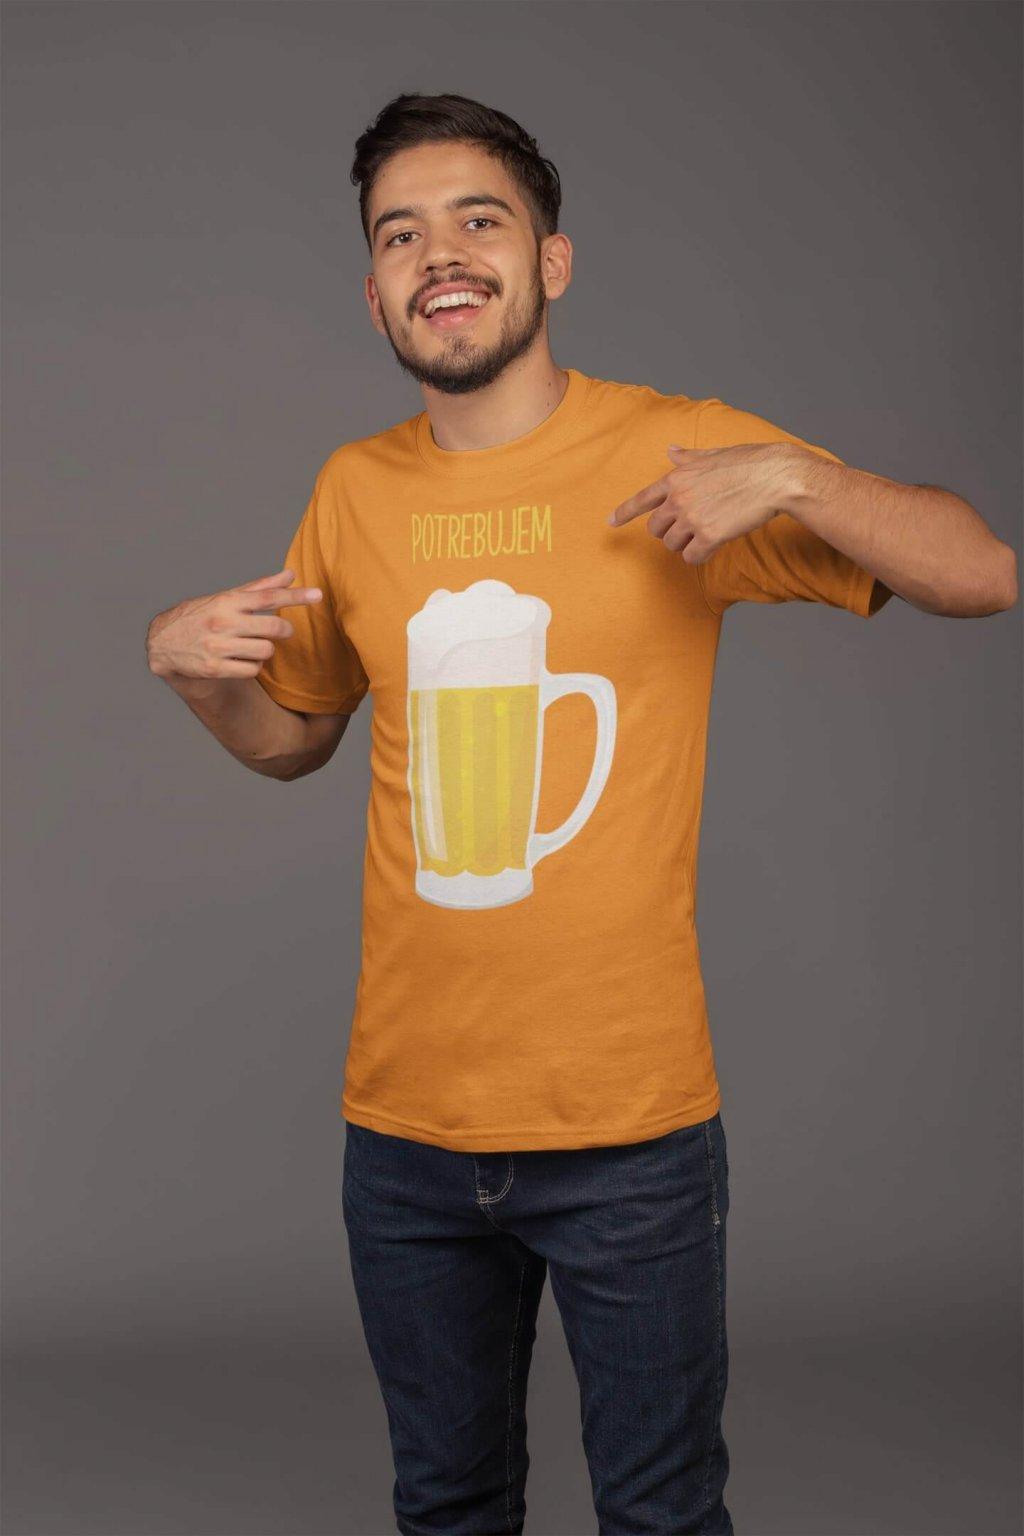 Tričko pre otca Potrebujem